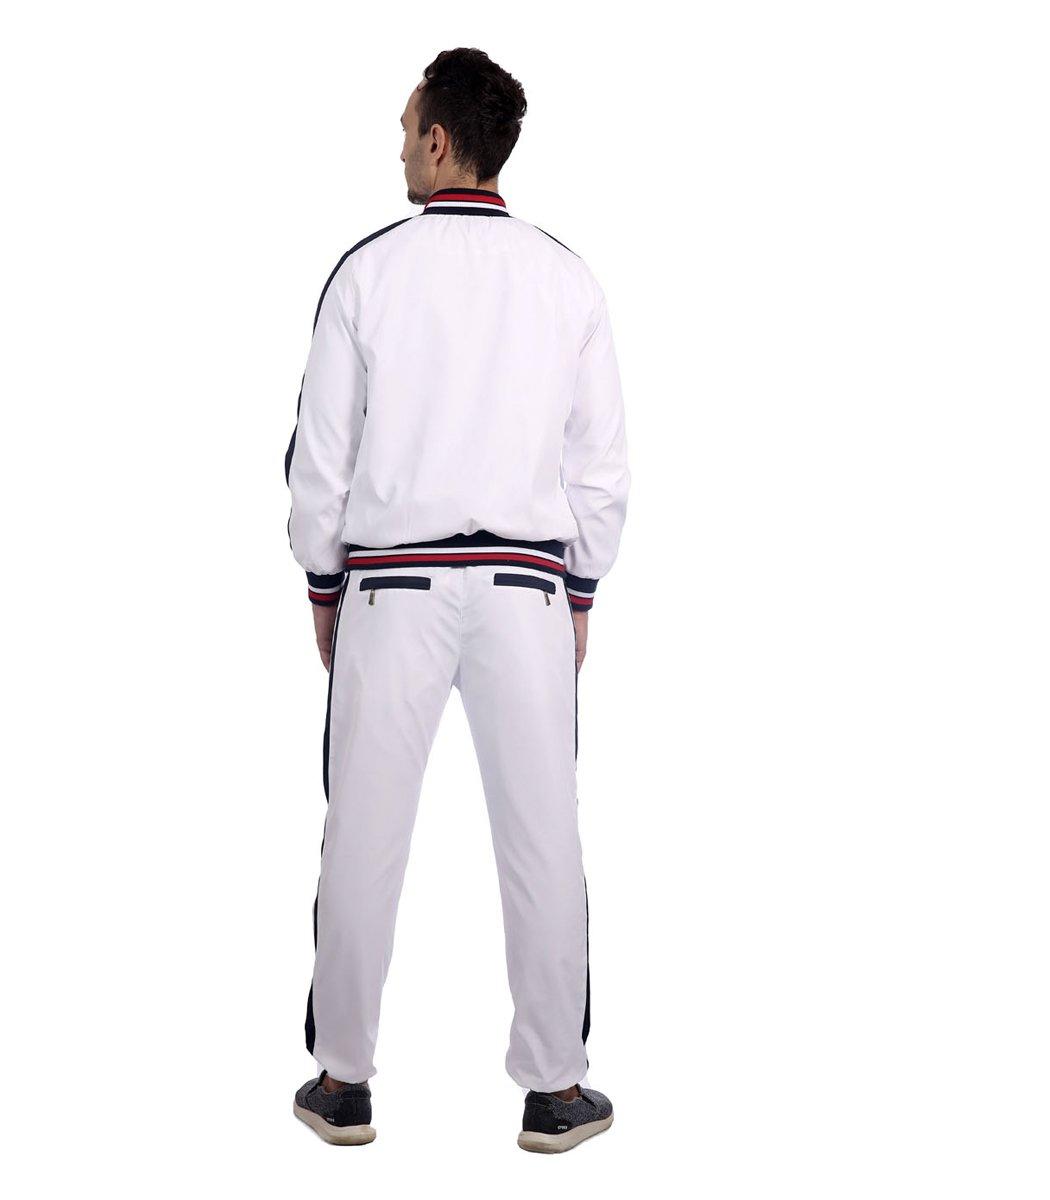 Спортивный костюм POLO Ralph Lauren Classic Белый/темно-синий - Белый - Вид 6